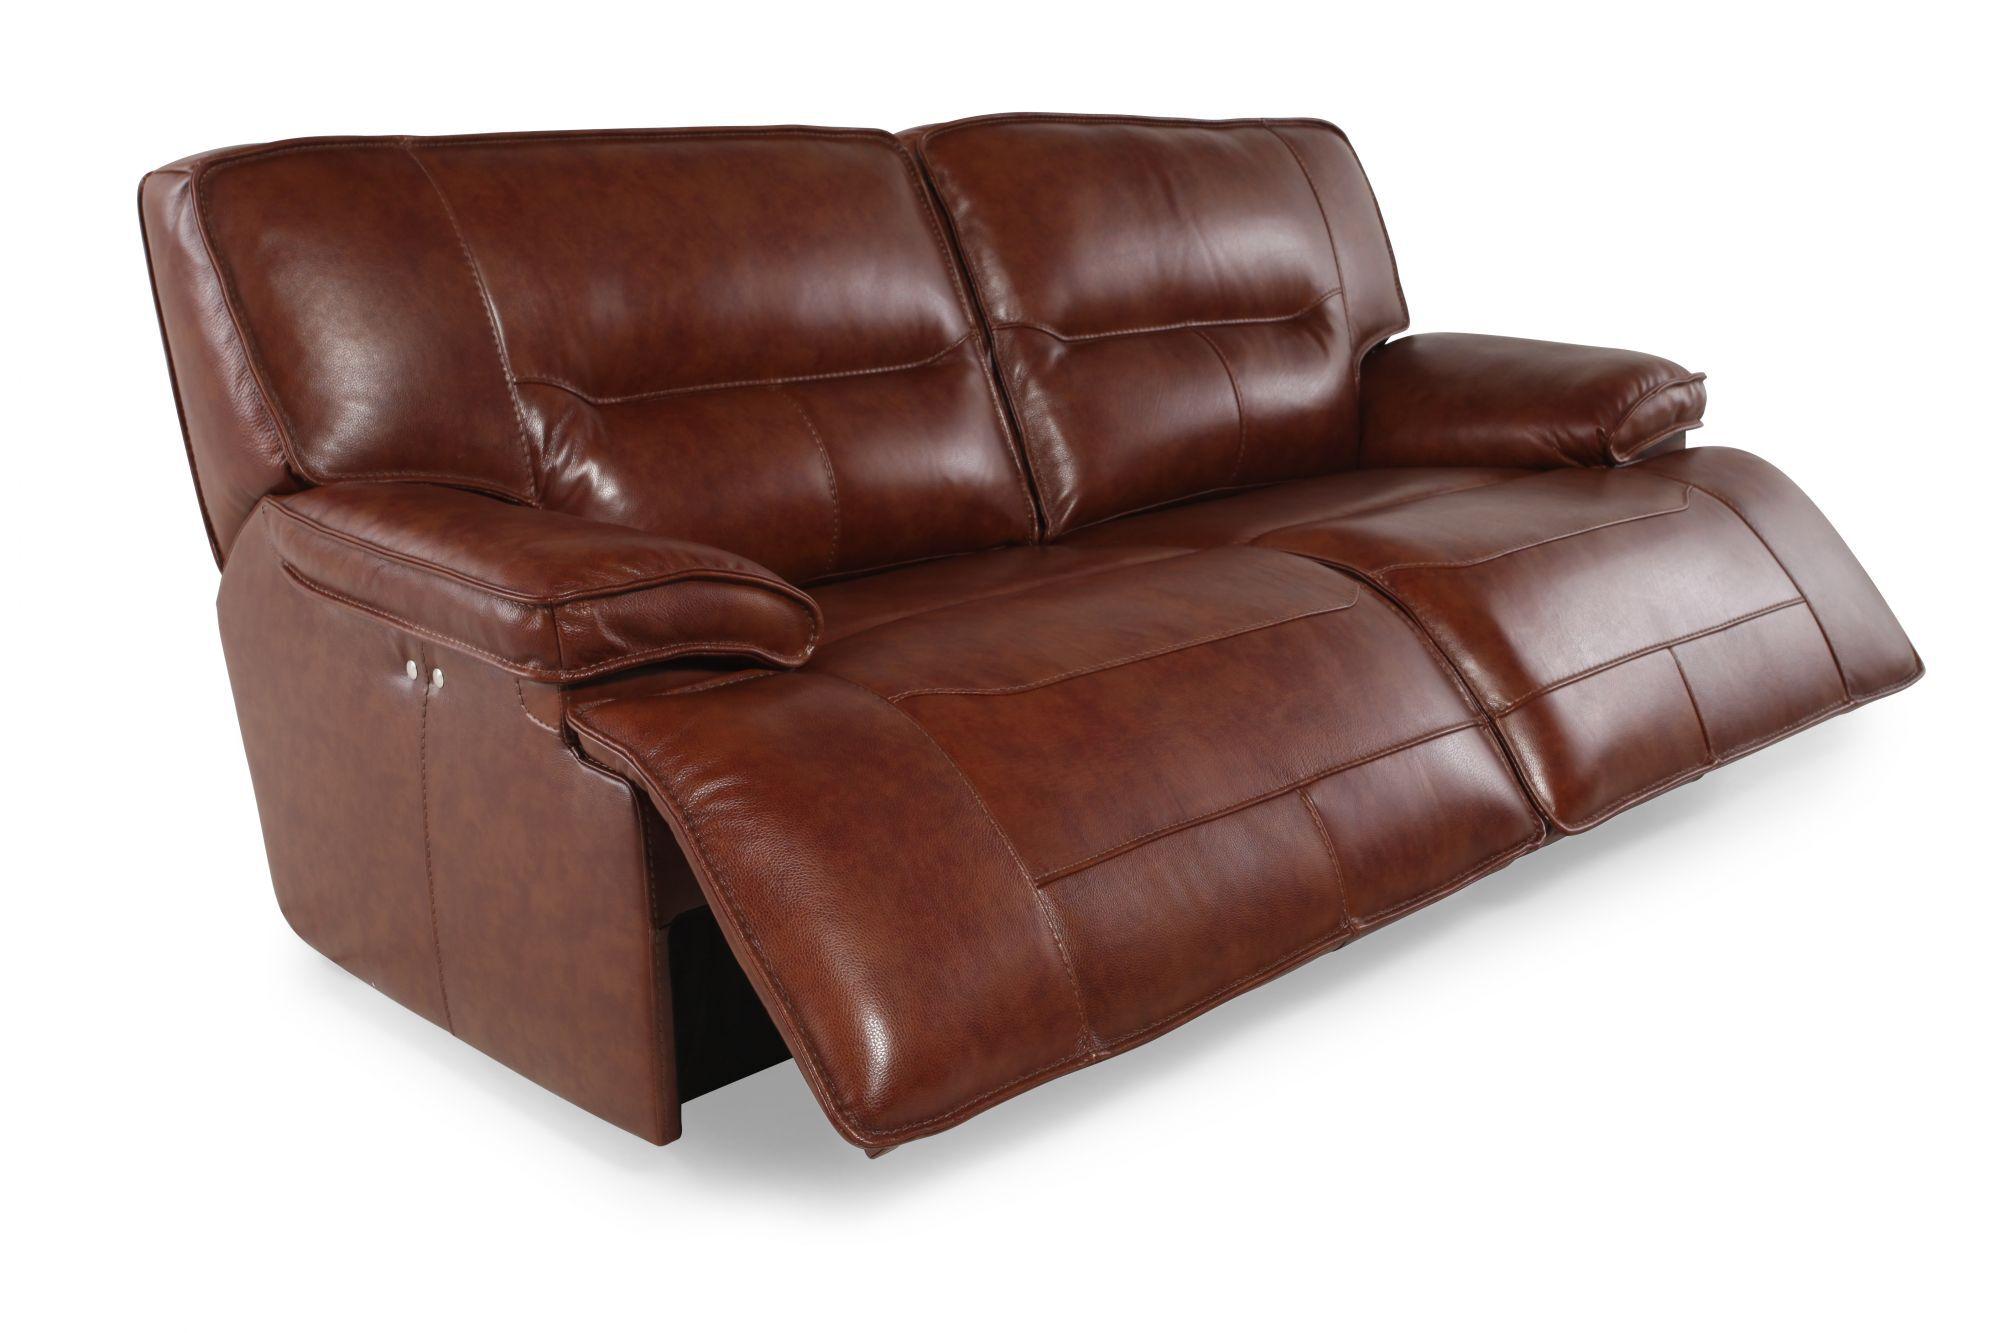 simon li stampede chestnut power reclining sofa - Simon Li Furniture